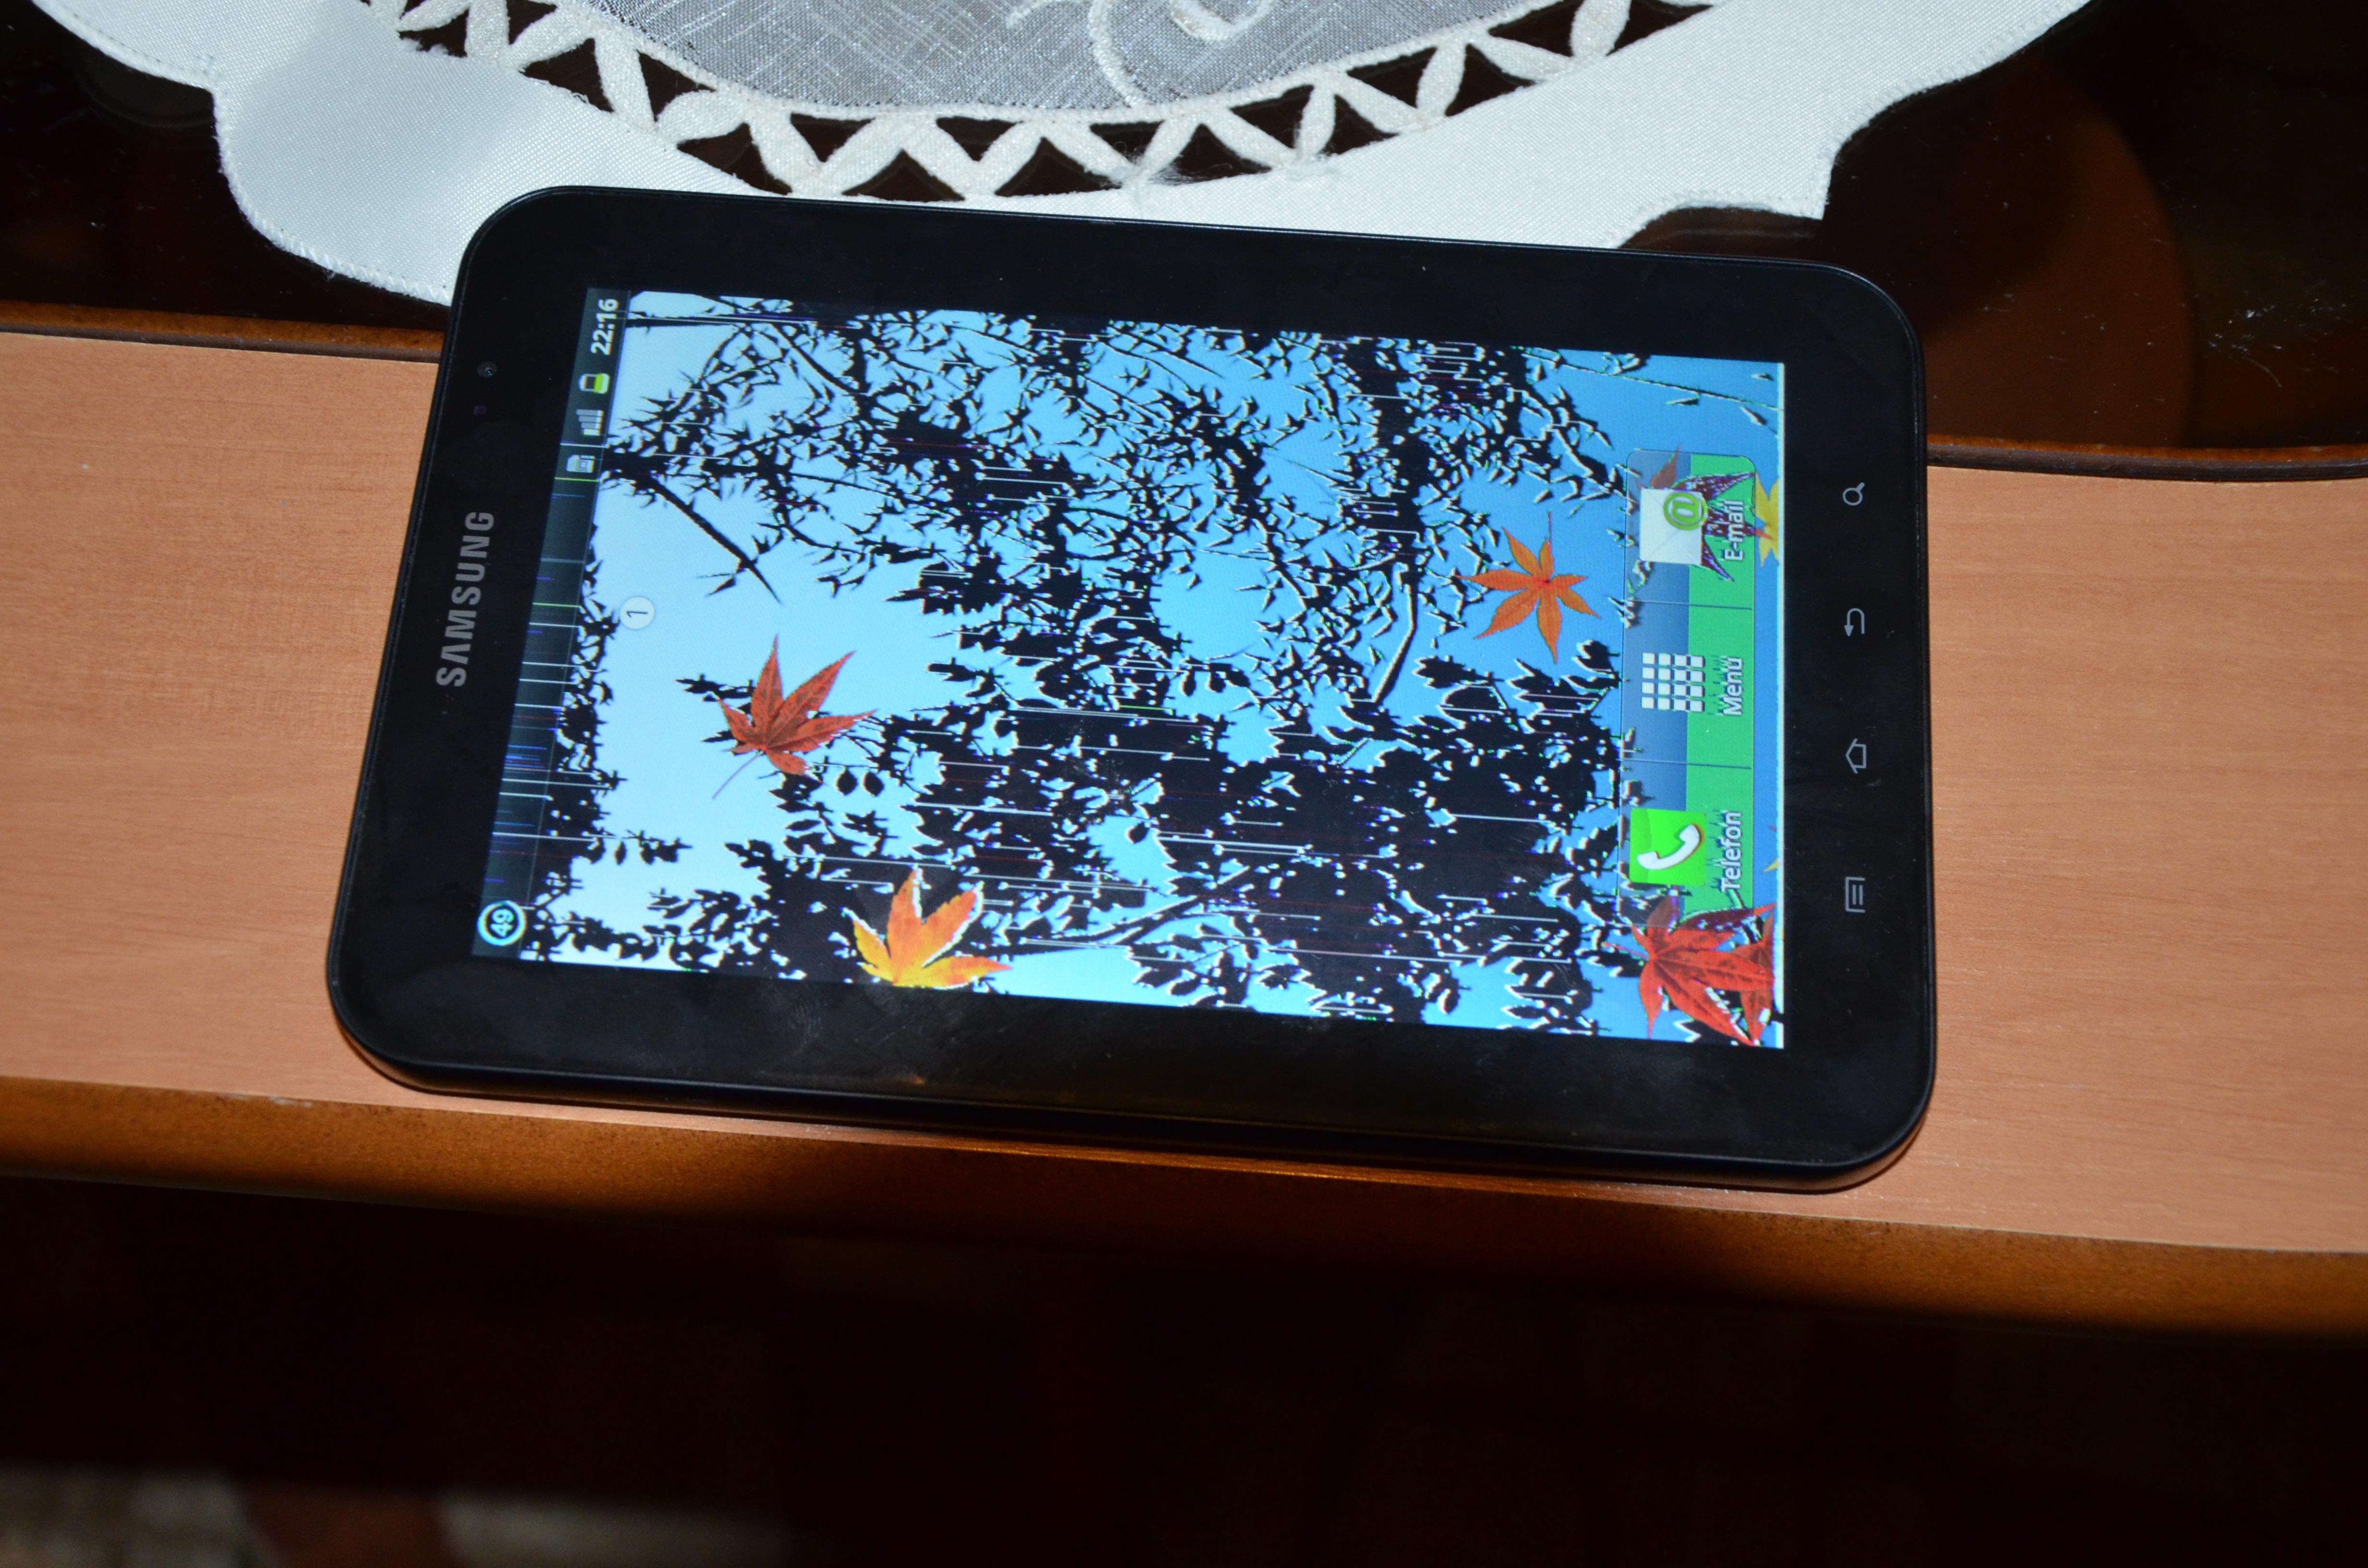 Samsung Galaxy Tab GT-P1000 - Na ekranie pojawiaj� si� kreski